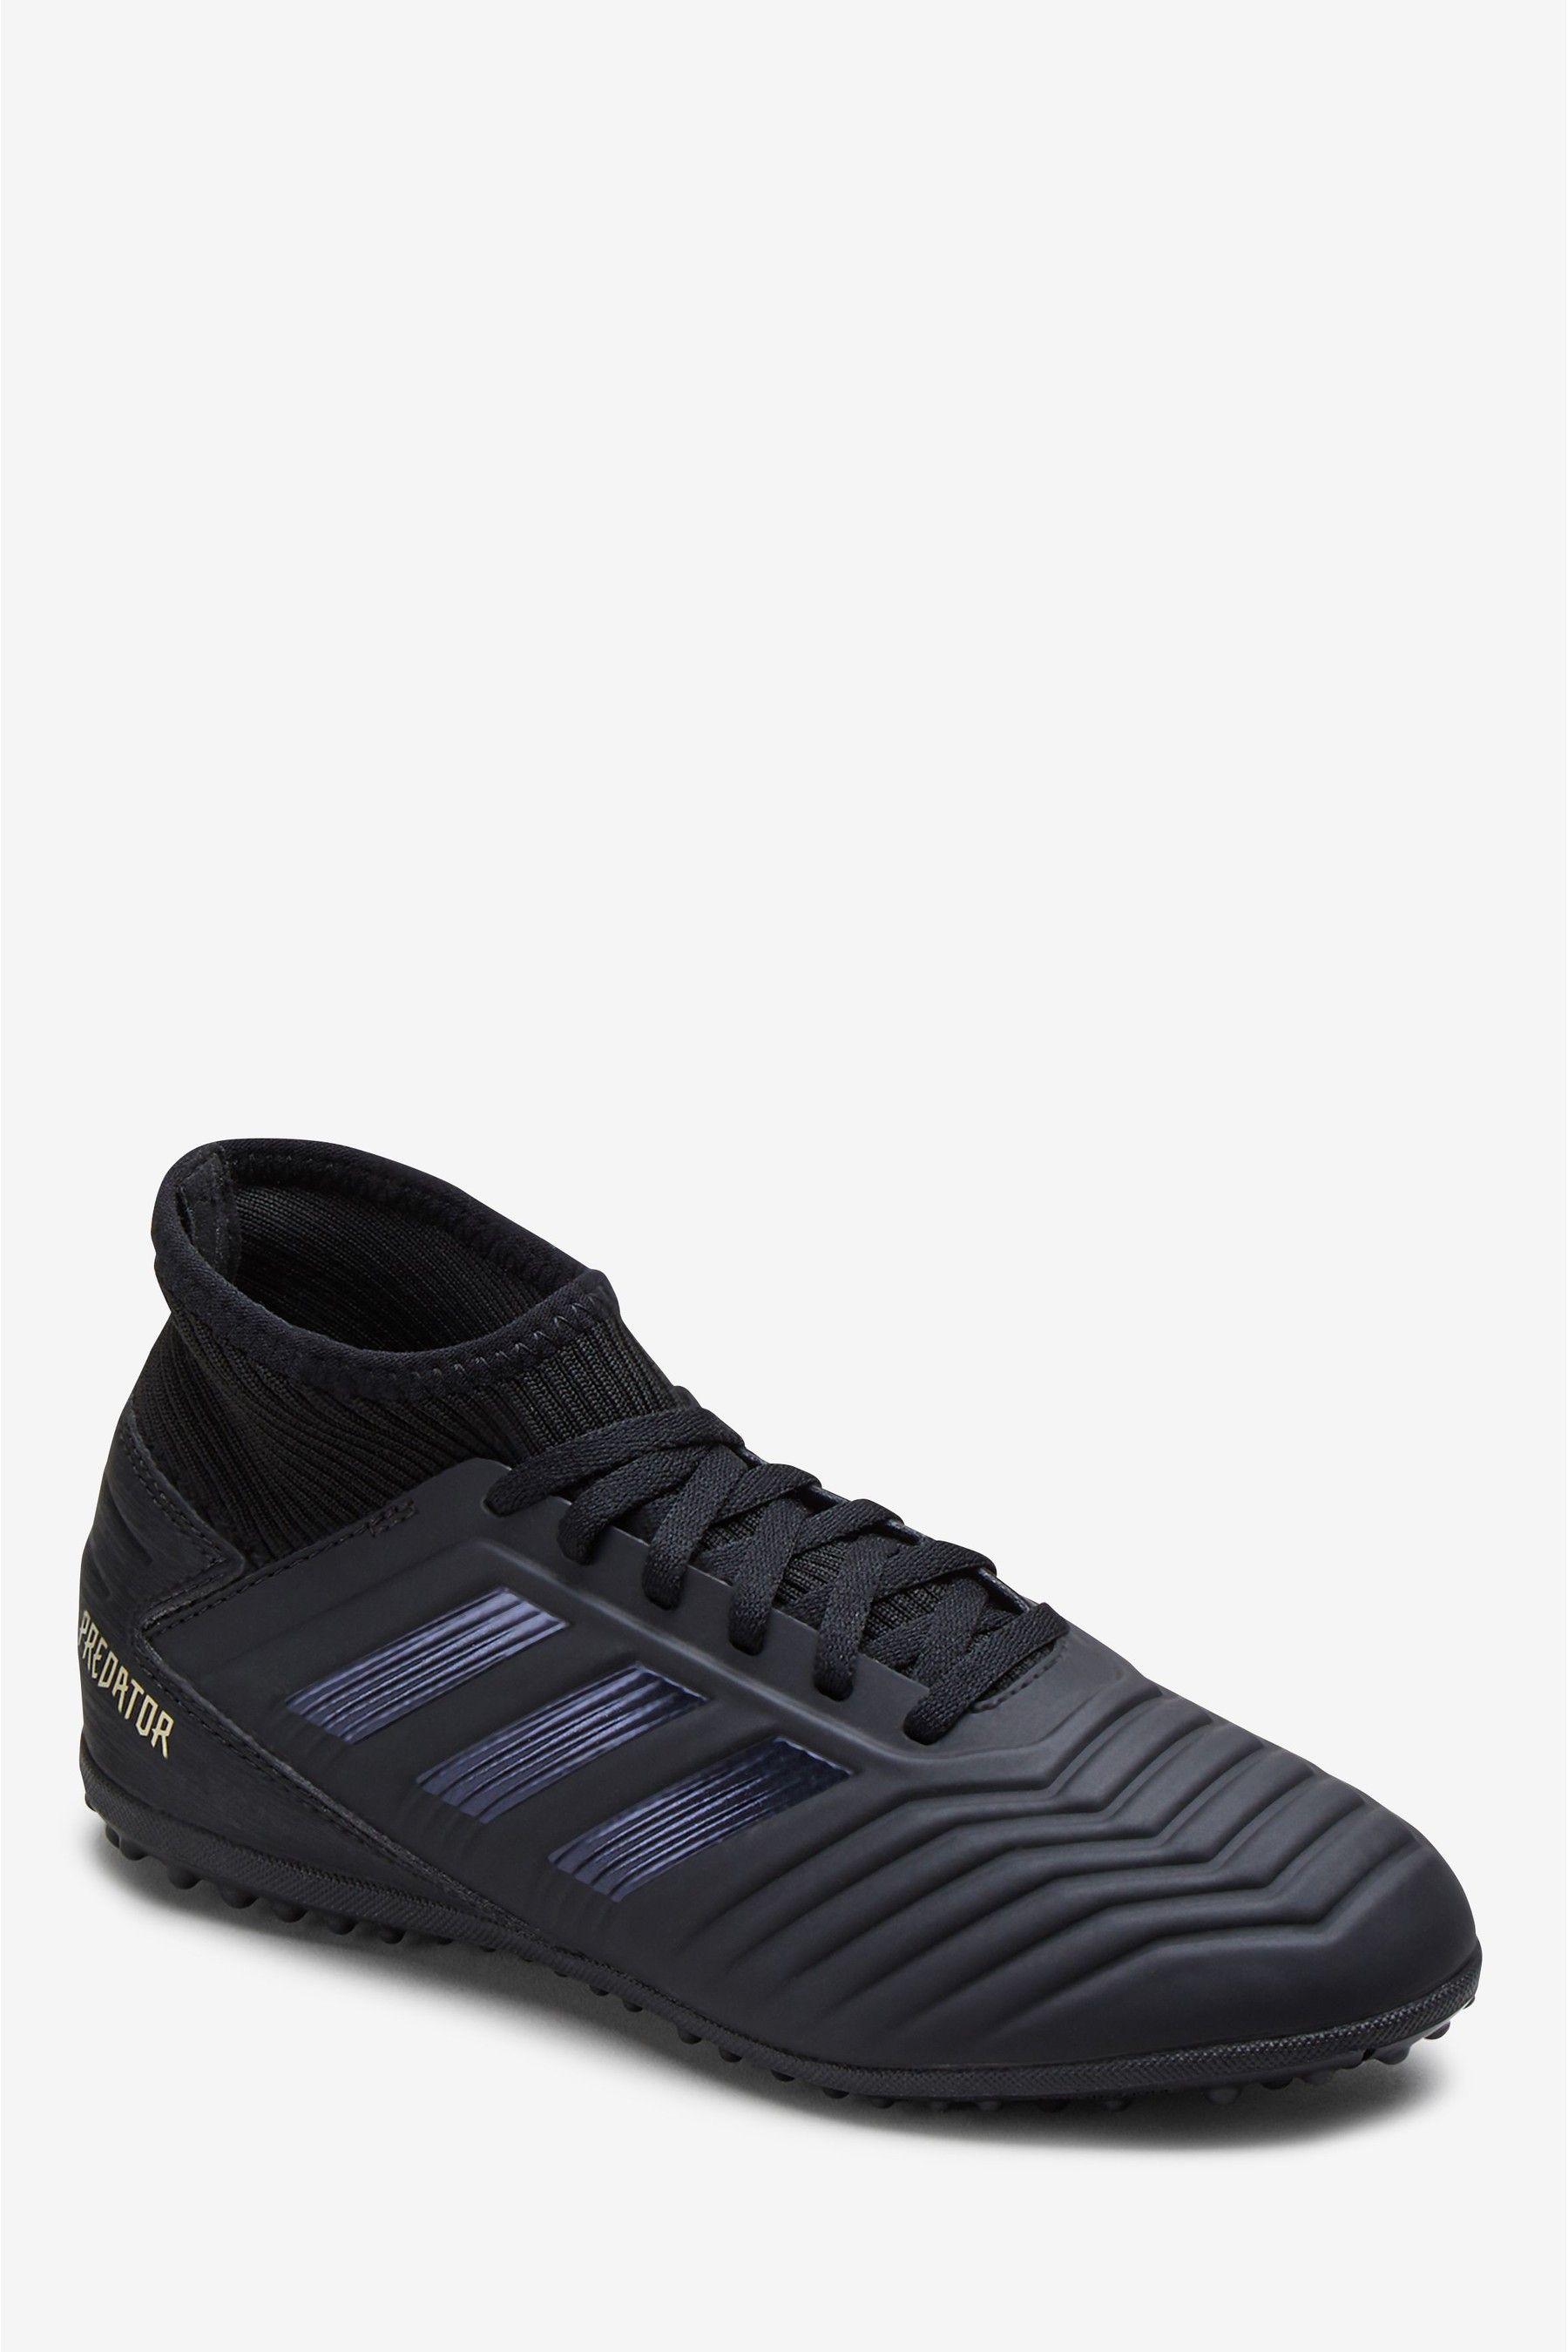 Boys adidas Dark Script Black Predator Turf Junior & Youth ...